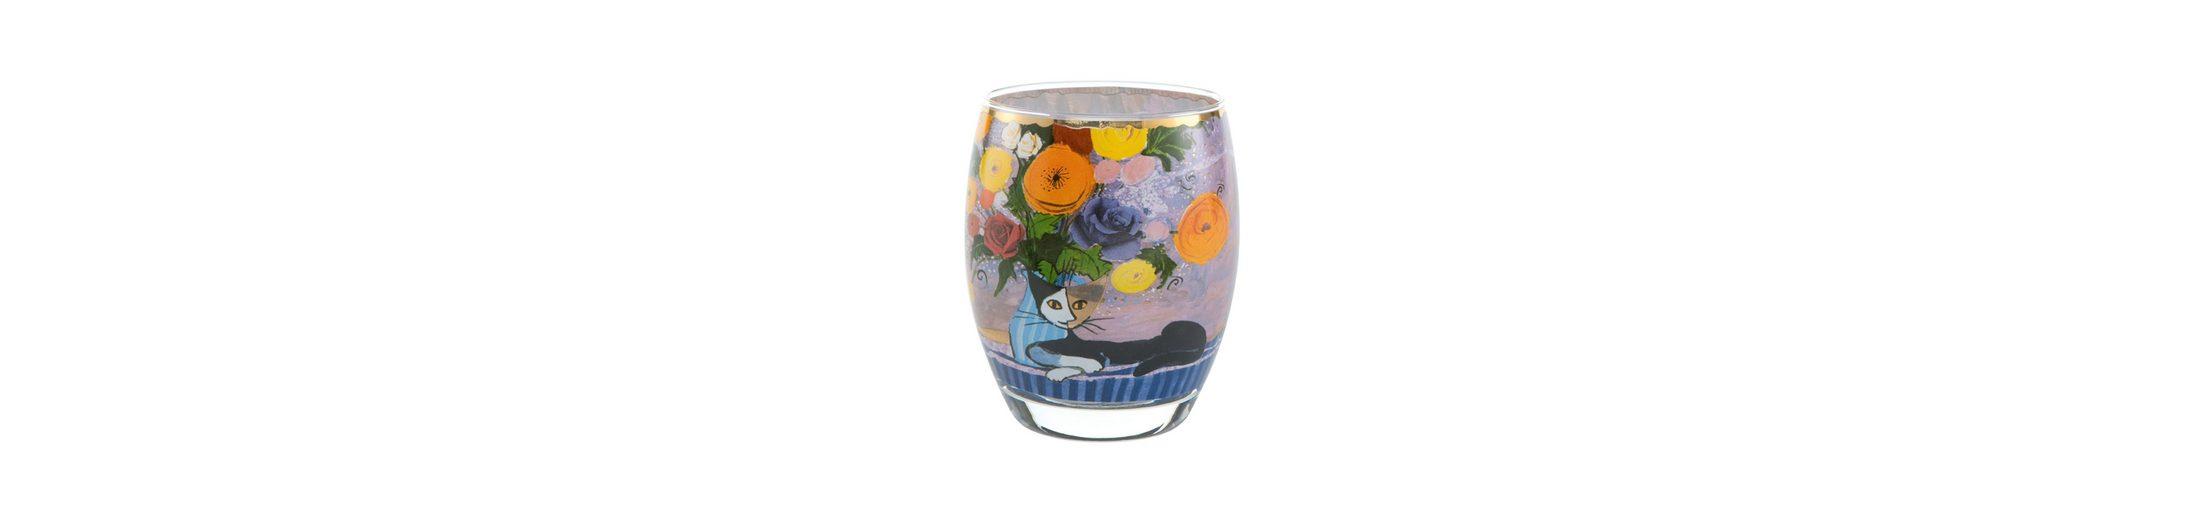 Goebel Innamorato - Teelicht »Rosina Wachtmeister«